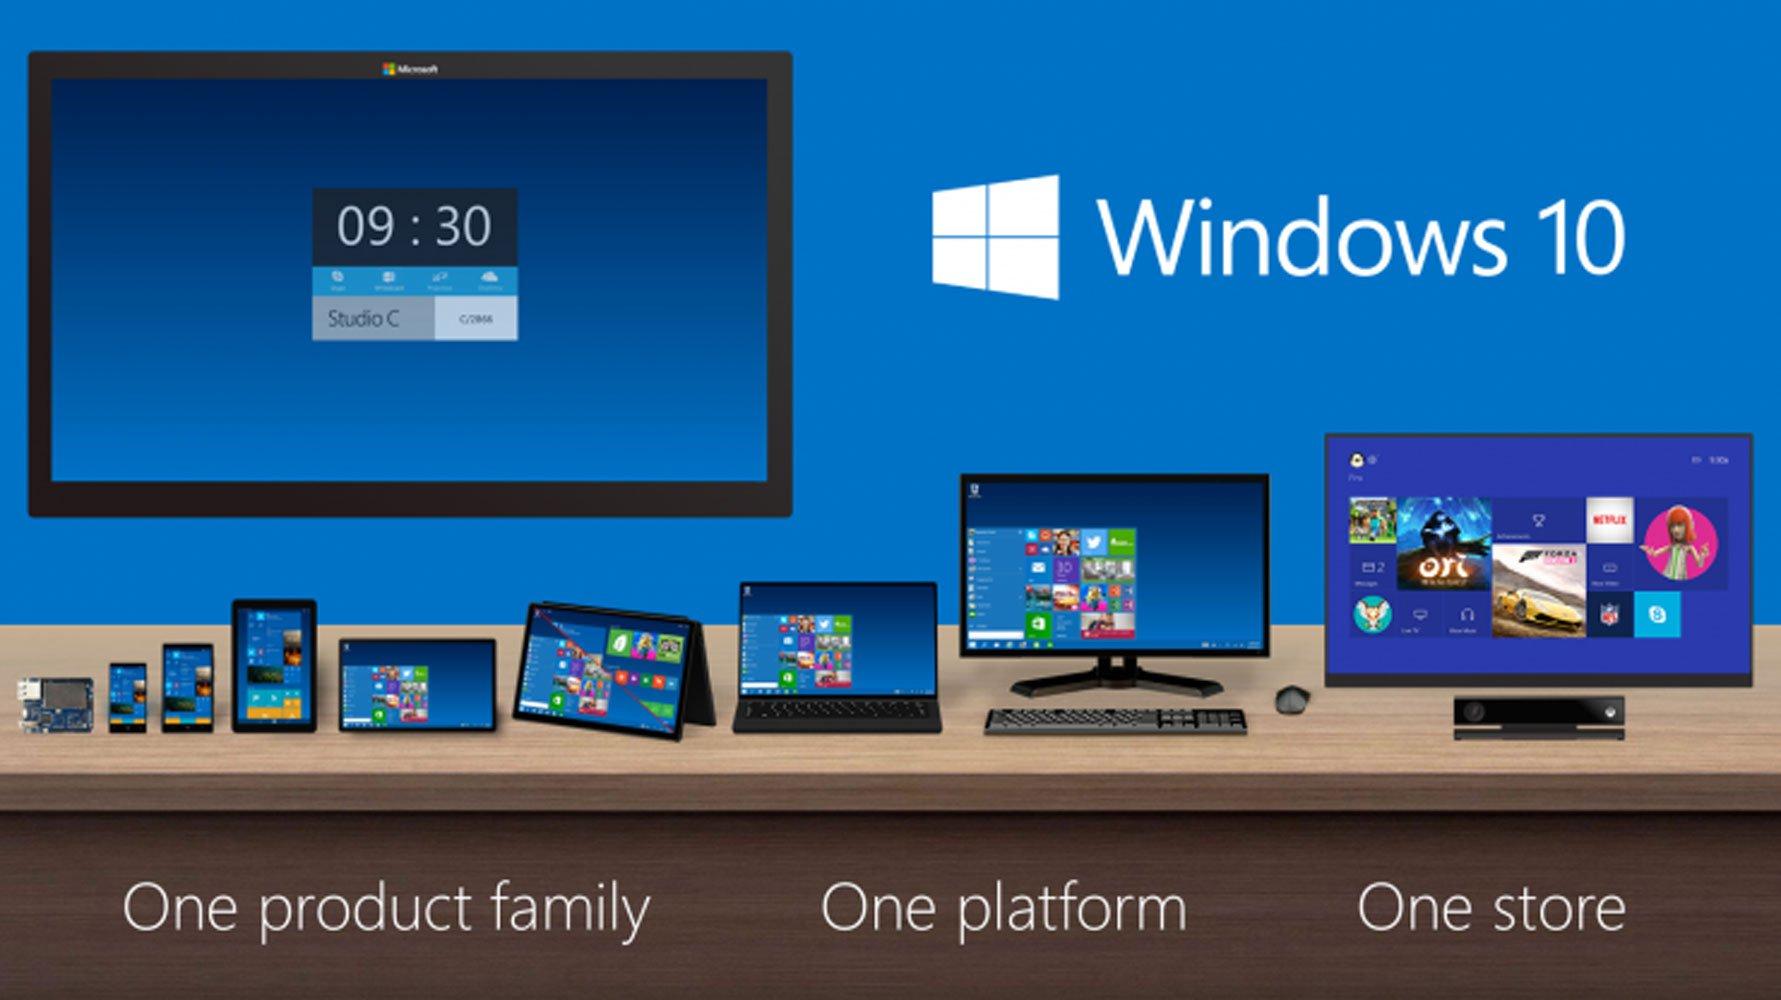 Windows 10 Professional License Key - $19.70 - OpiumPulses.com